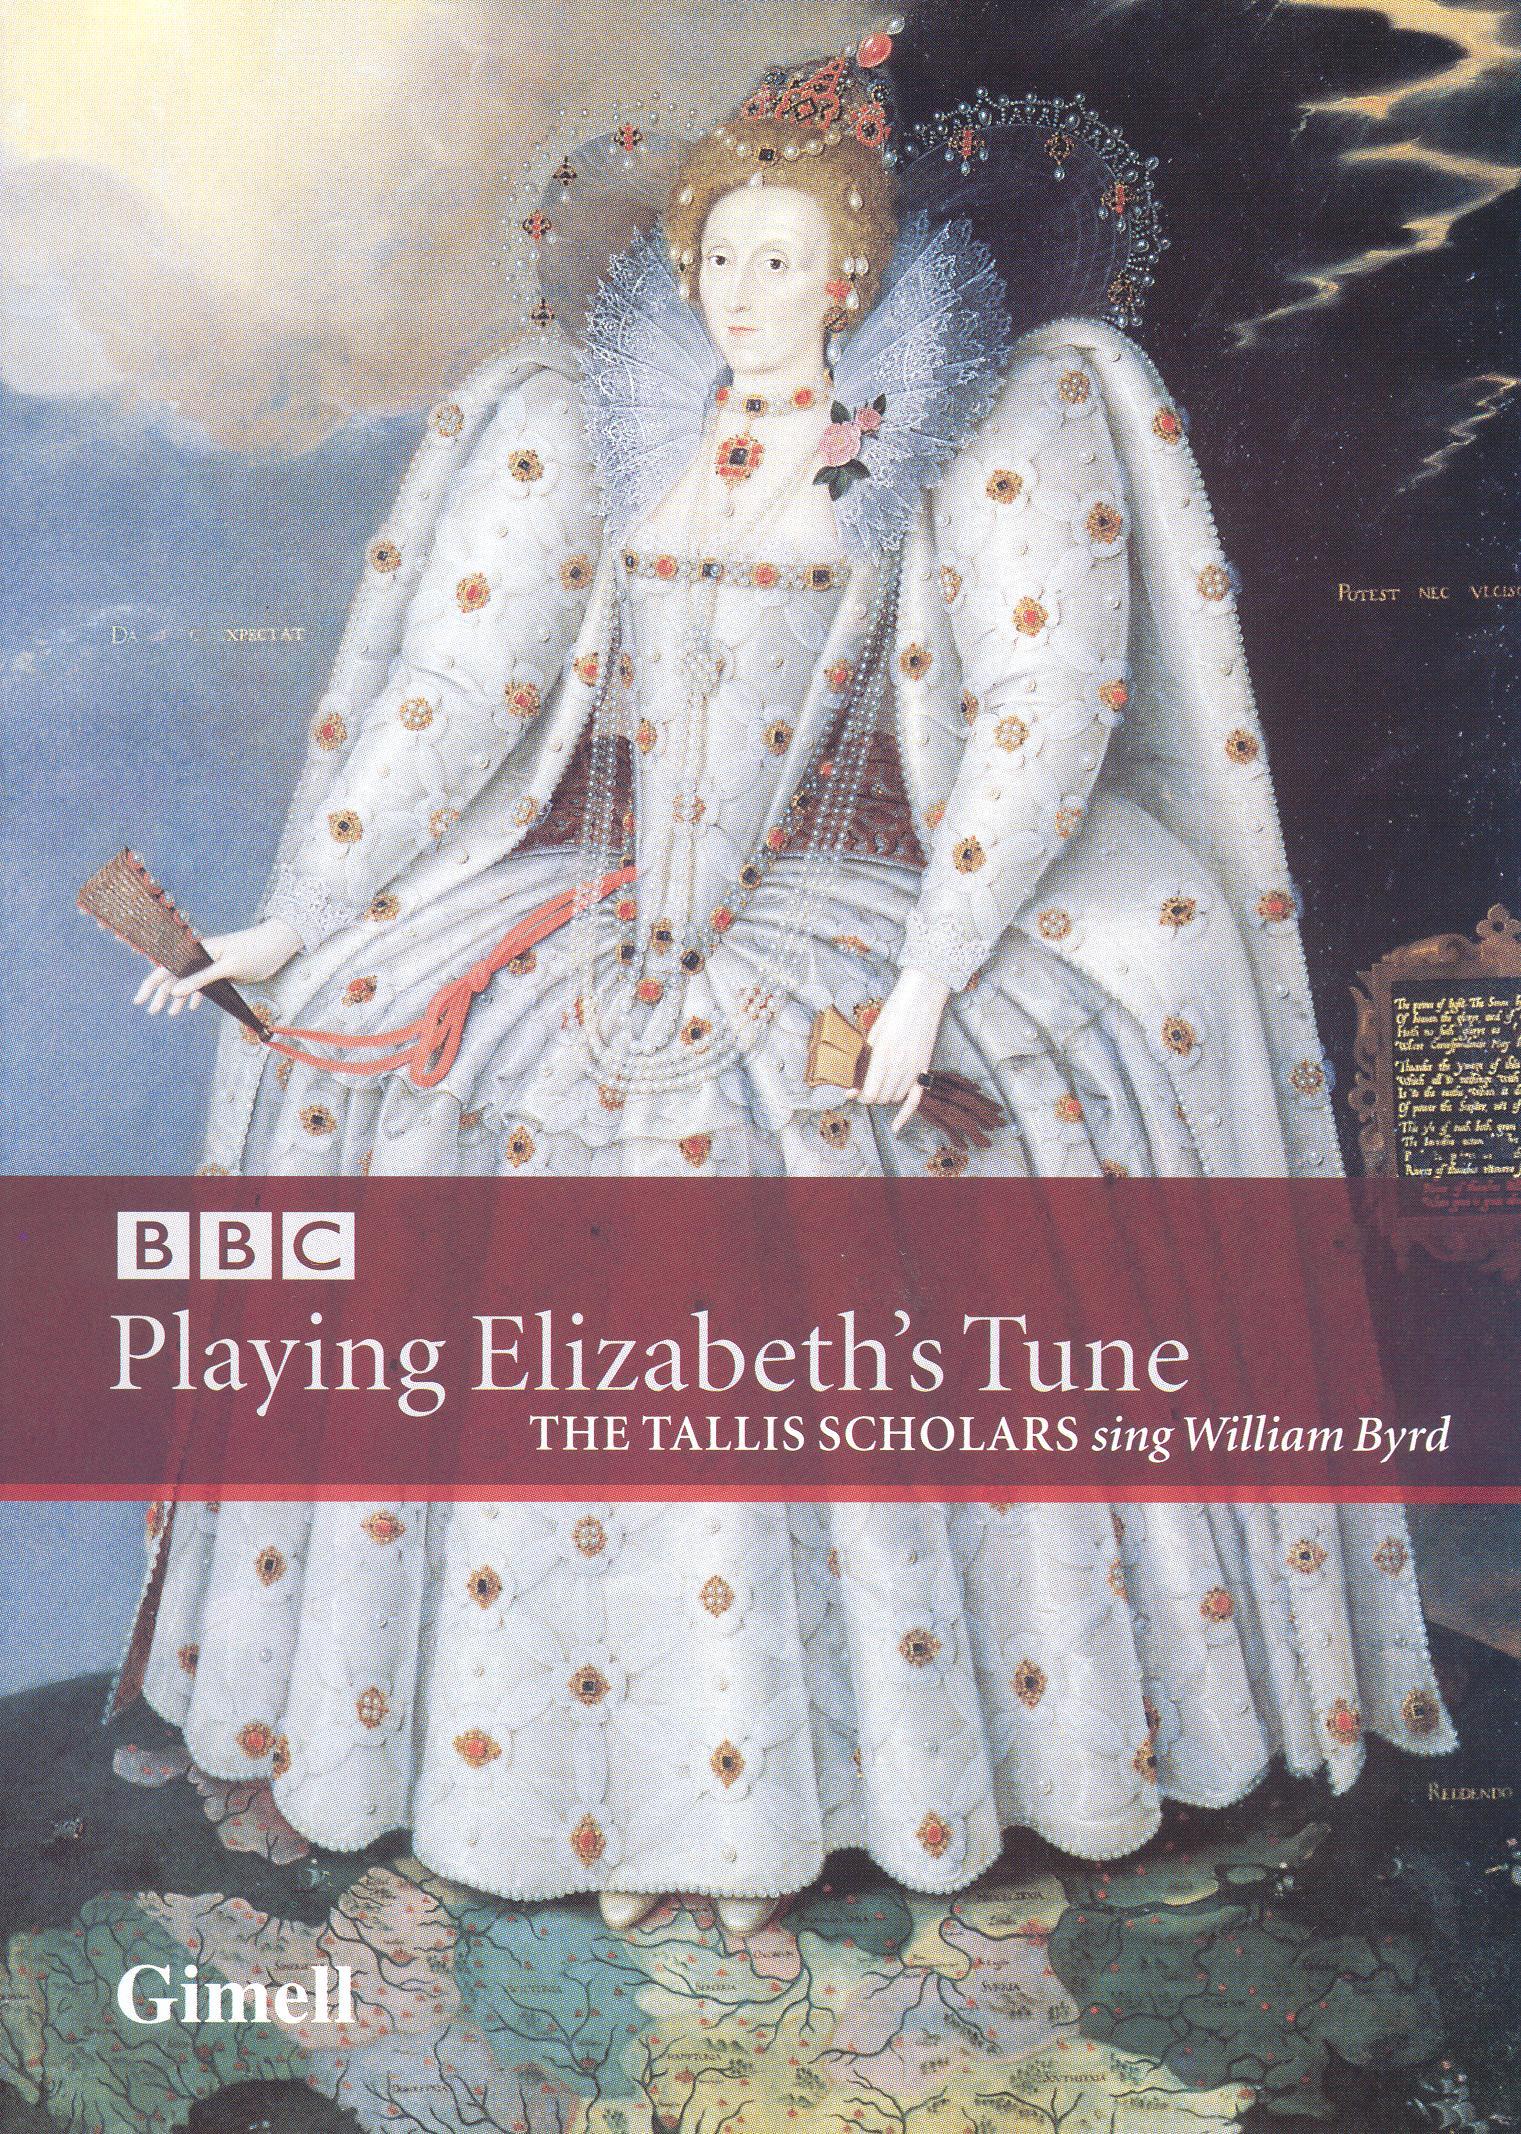 Playing Elizabeth's Tune: The Tallis Scholars Sing William Byrd